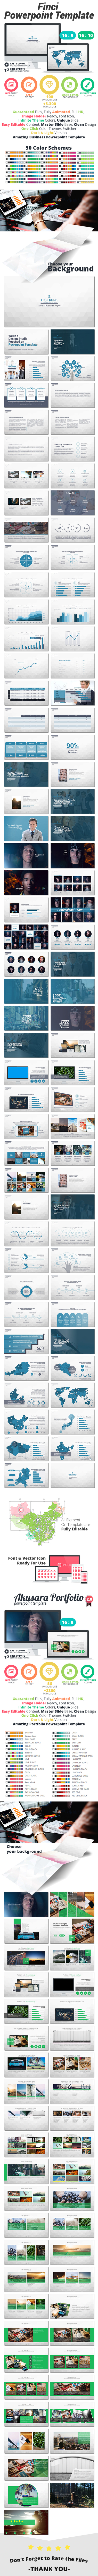 BalikuCreative Bundle Vol.1 - Business PowerPoint Templates